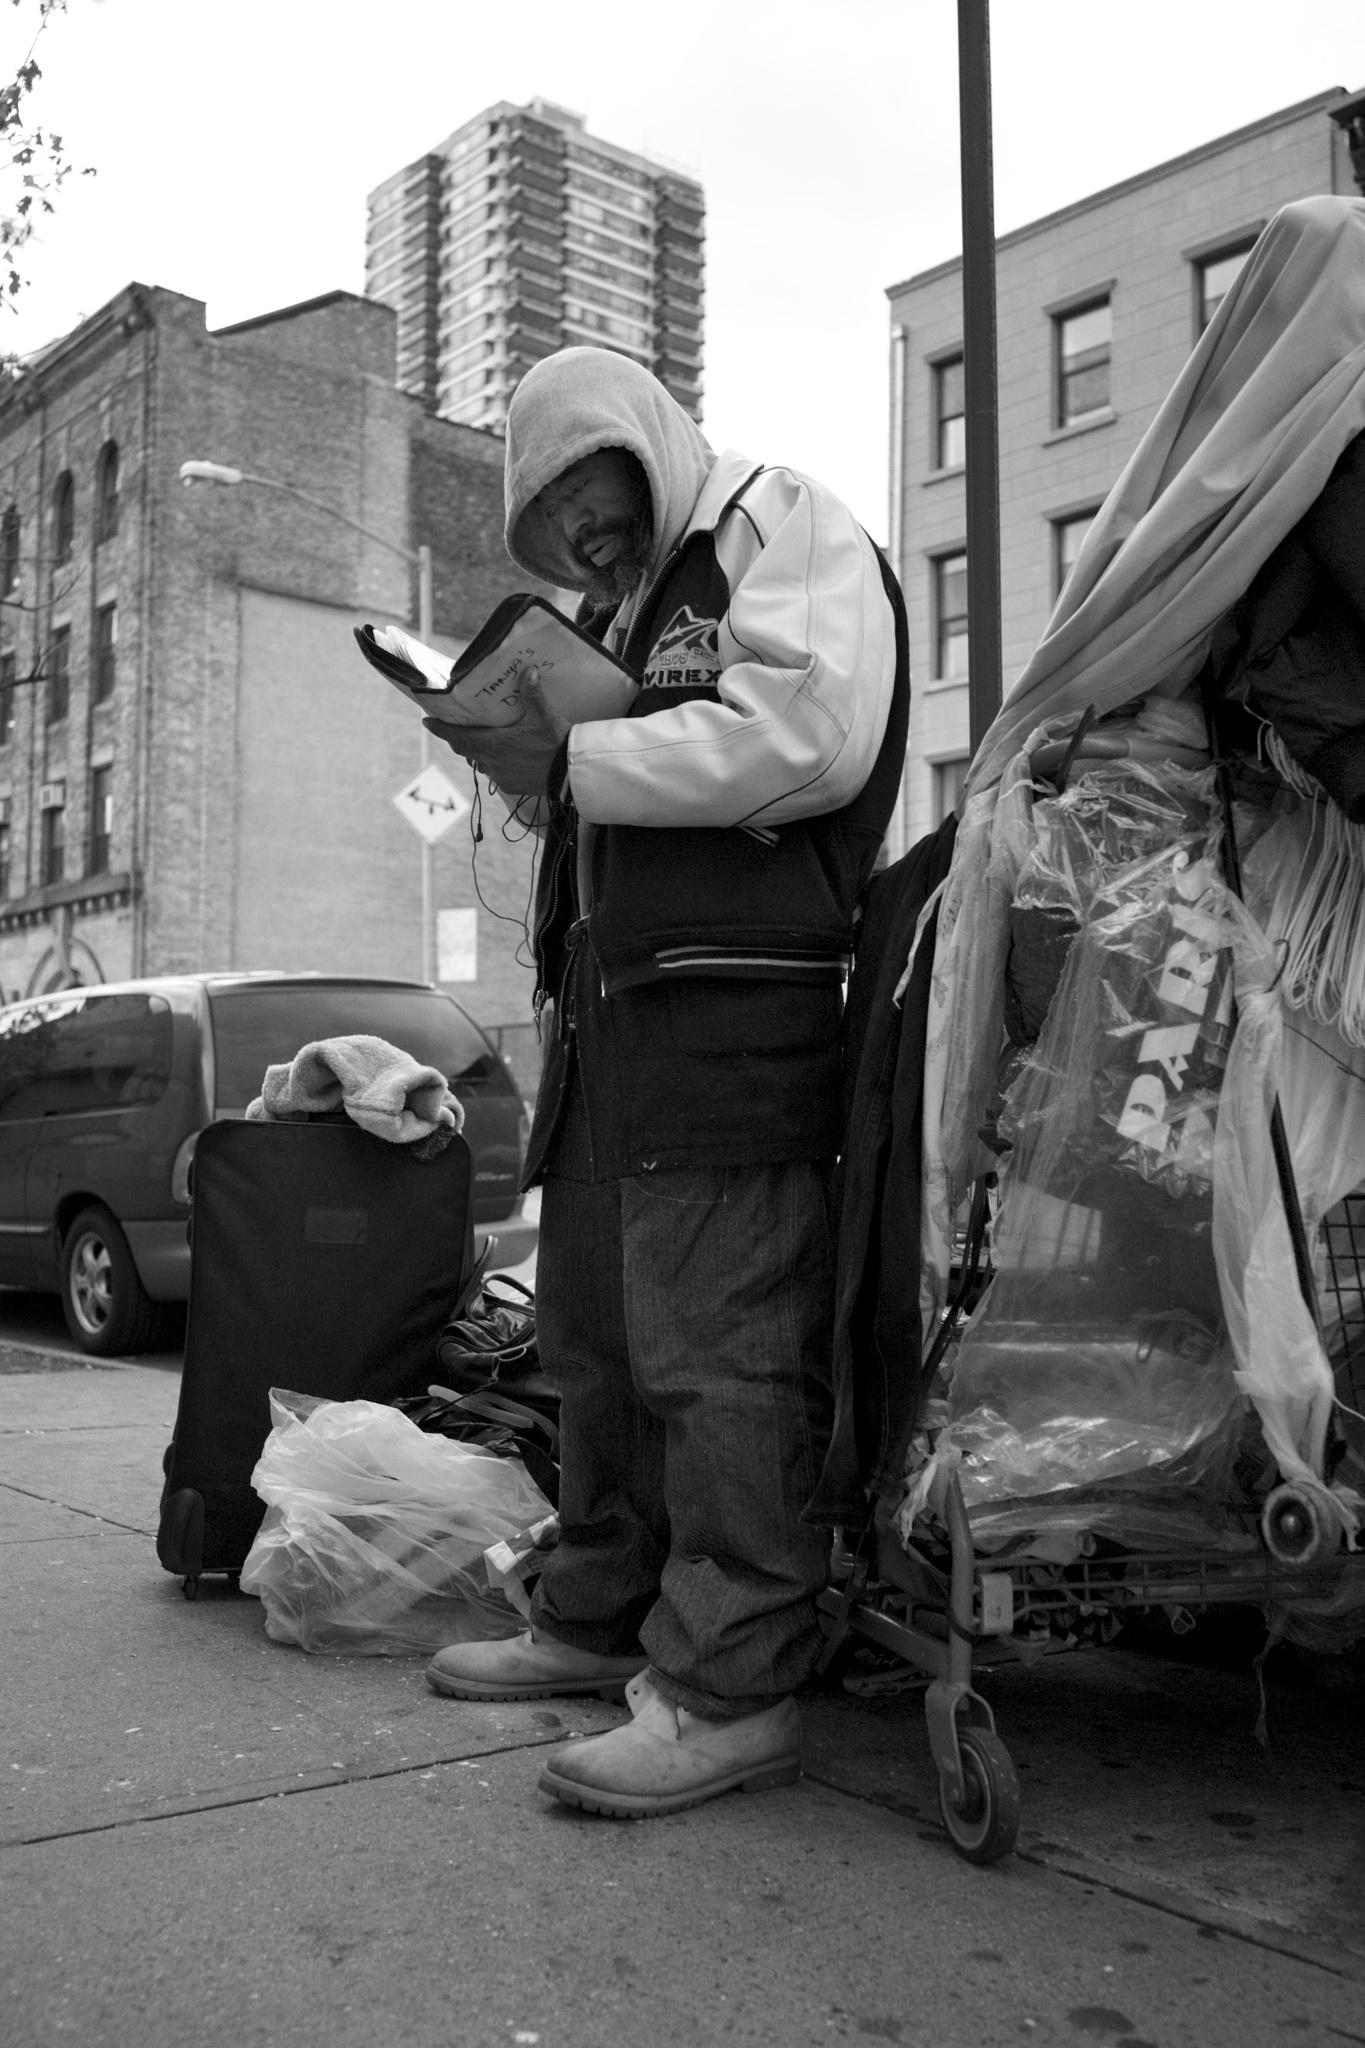 Harlem street life... by Grant Brooks